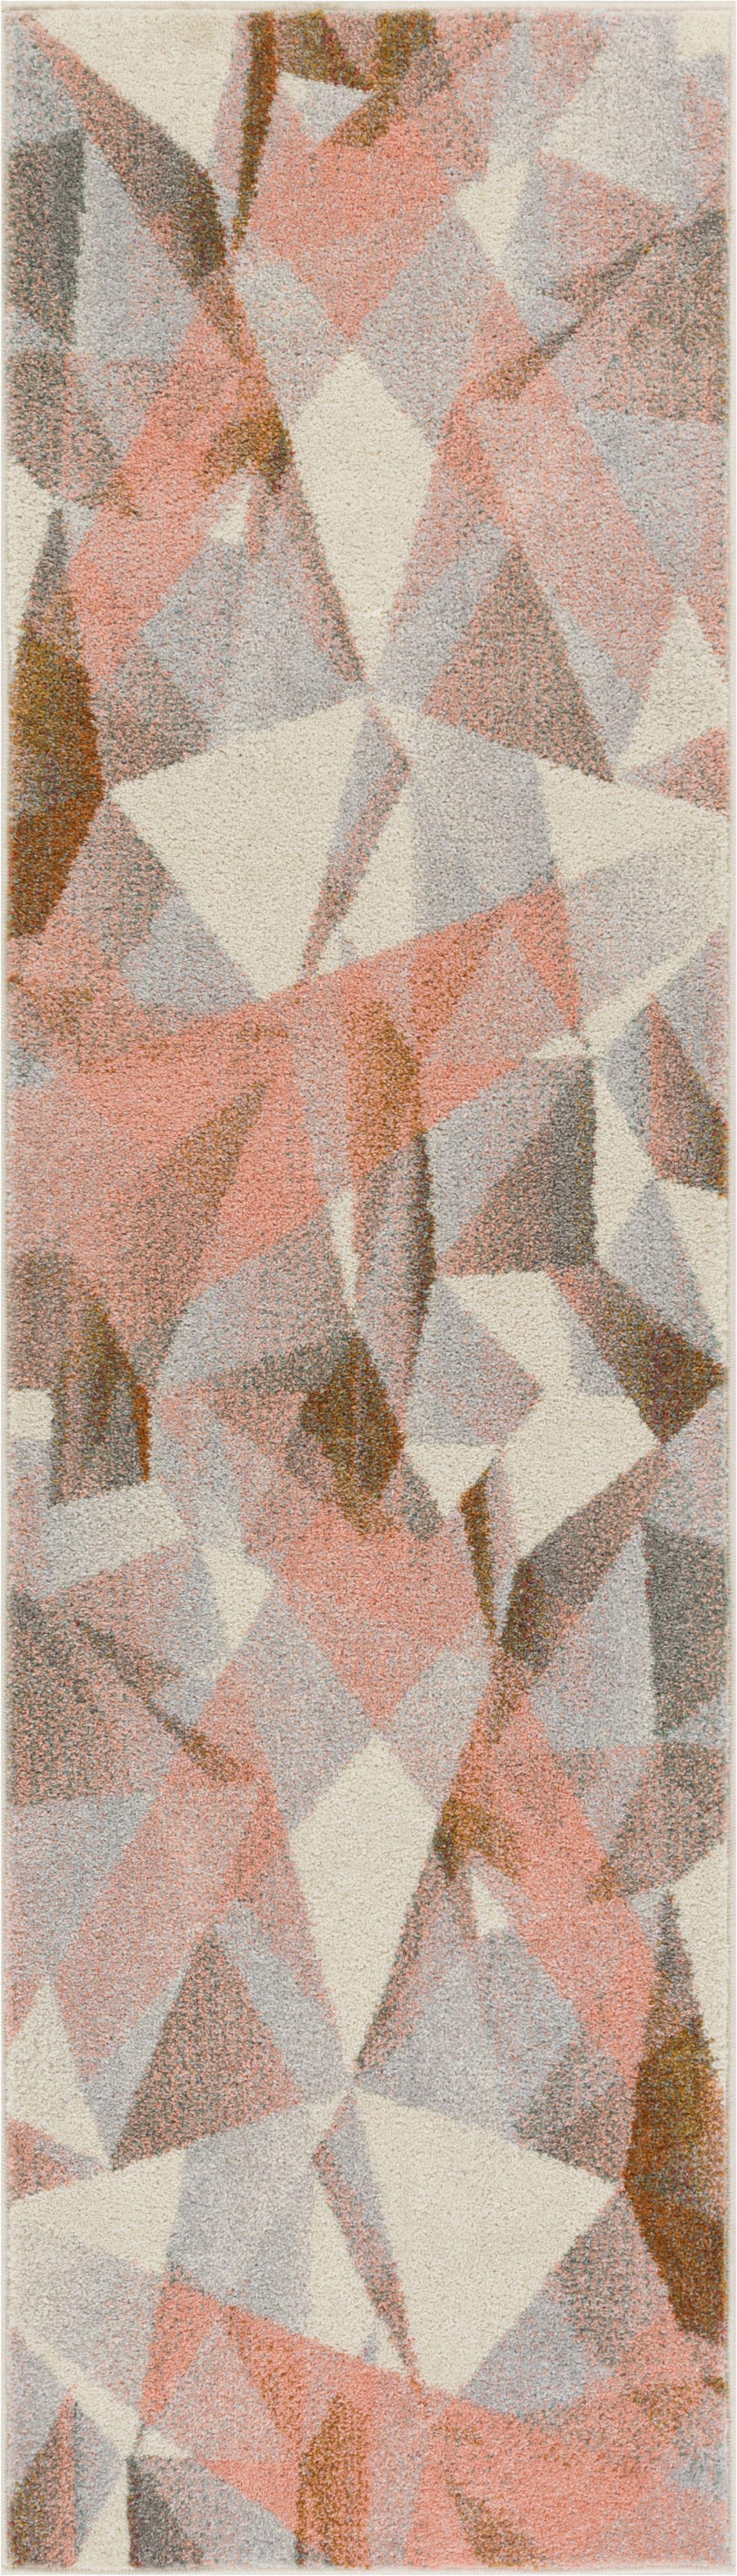 Camren Modern Geometric Prisma Triangle Pink Area Rug Rug Size: 7'10